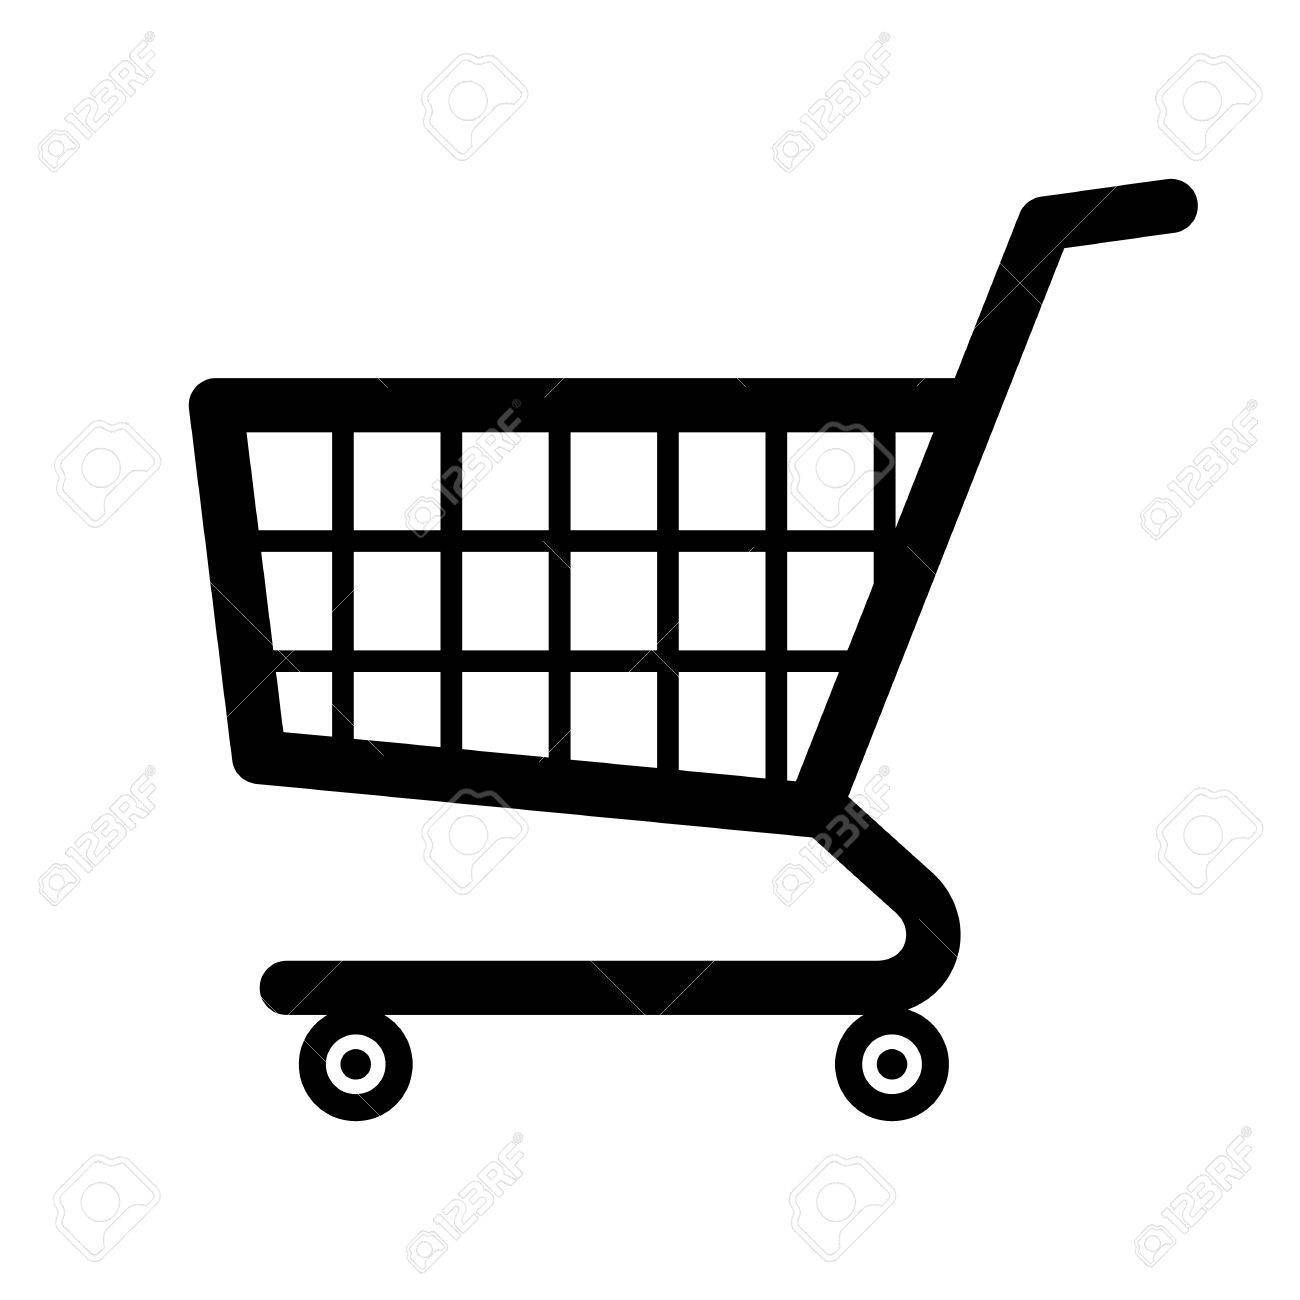 Shopping cart icon - 54302312